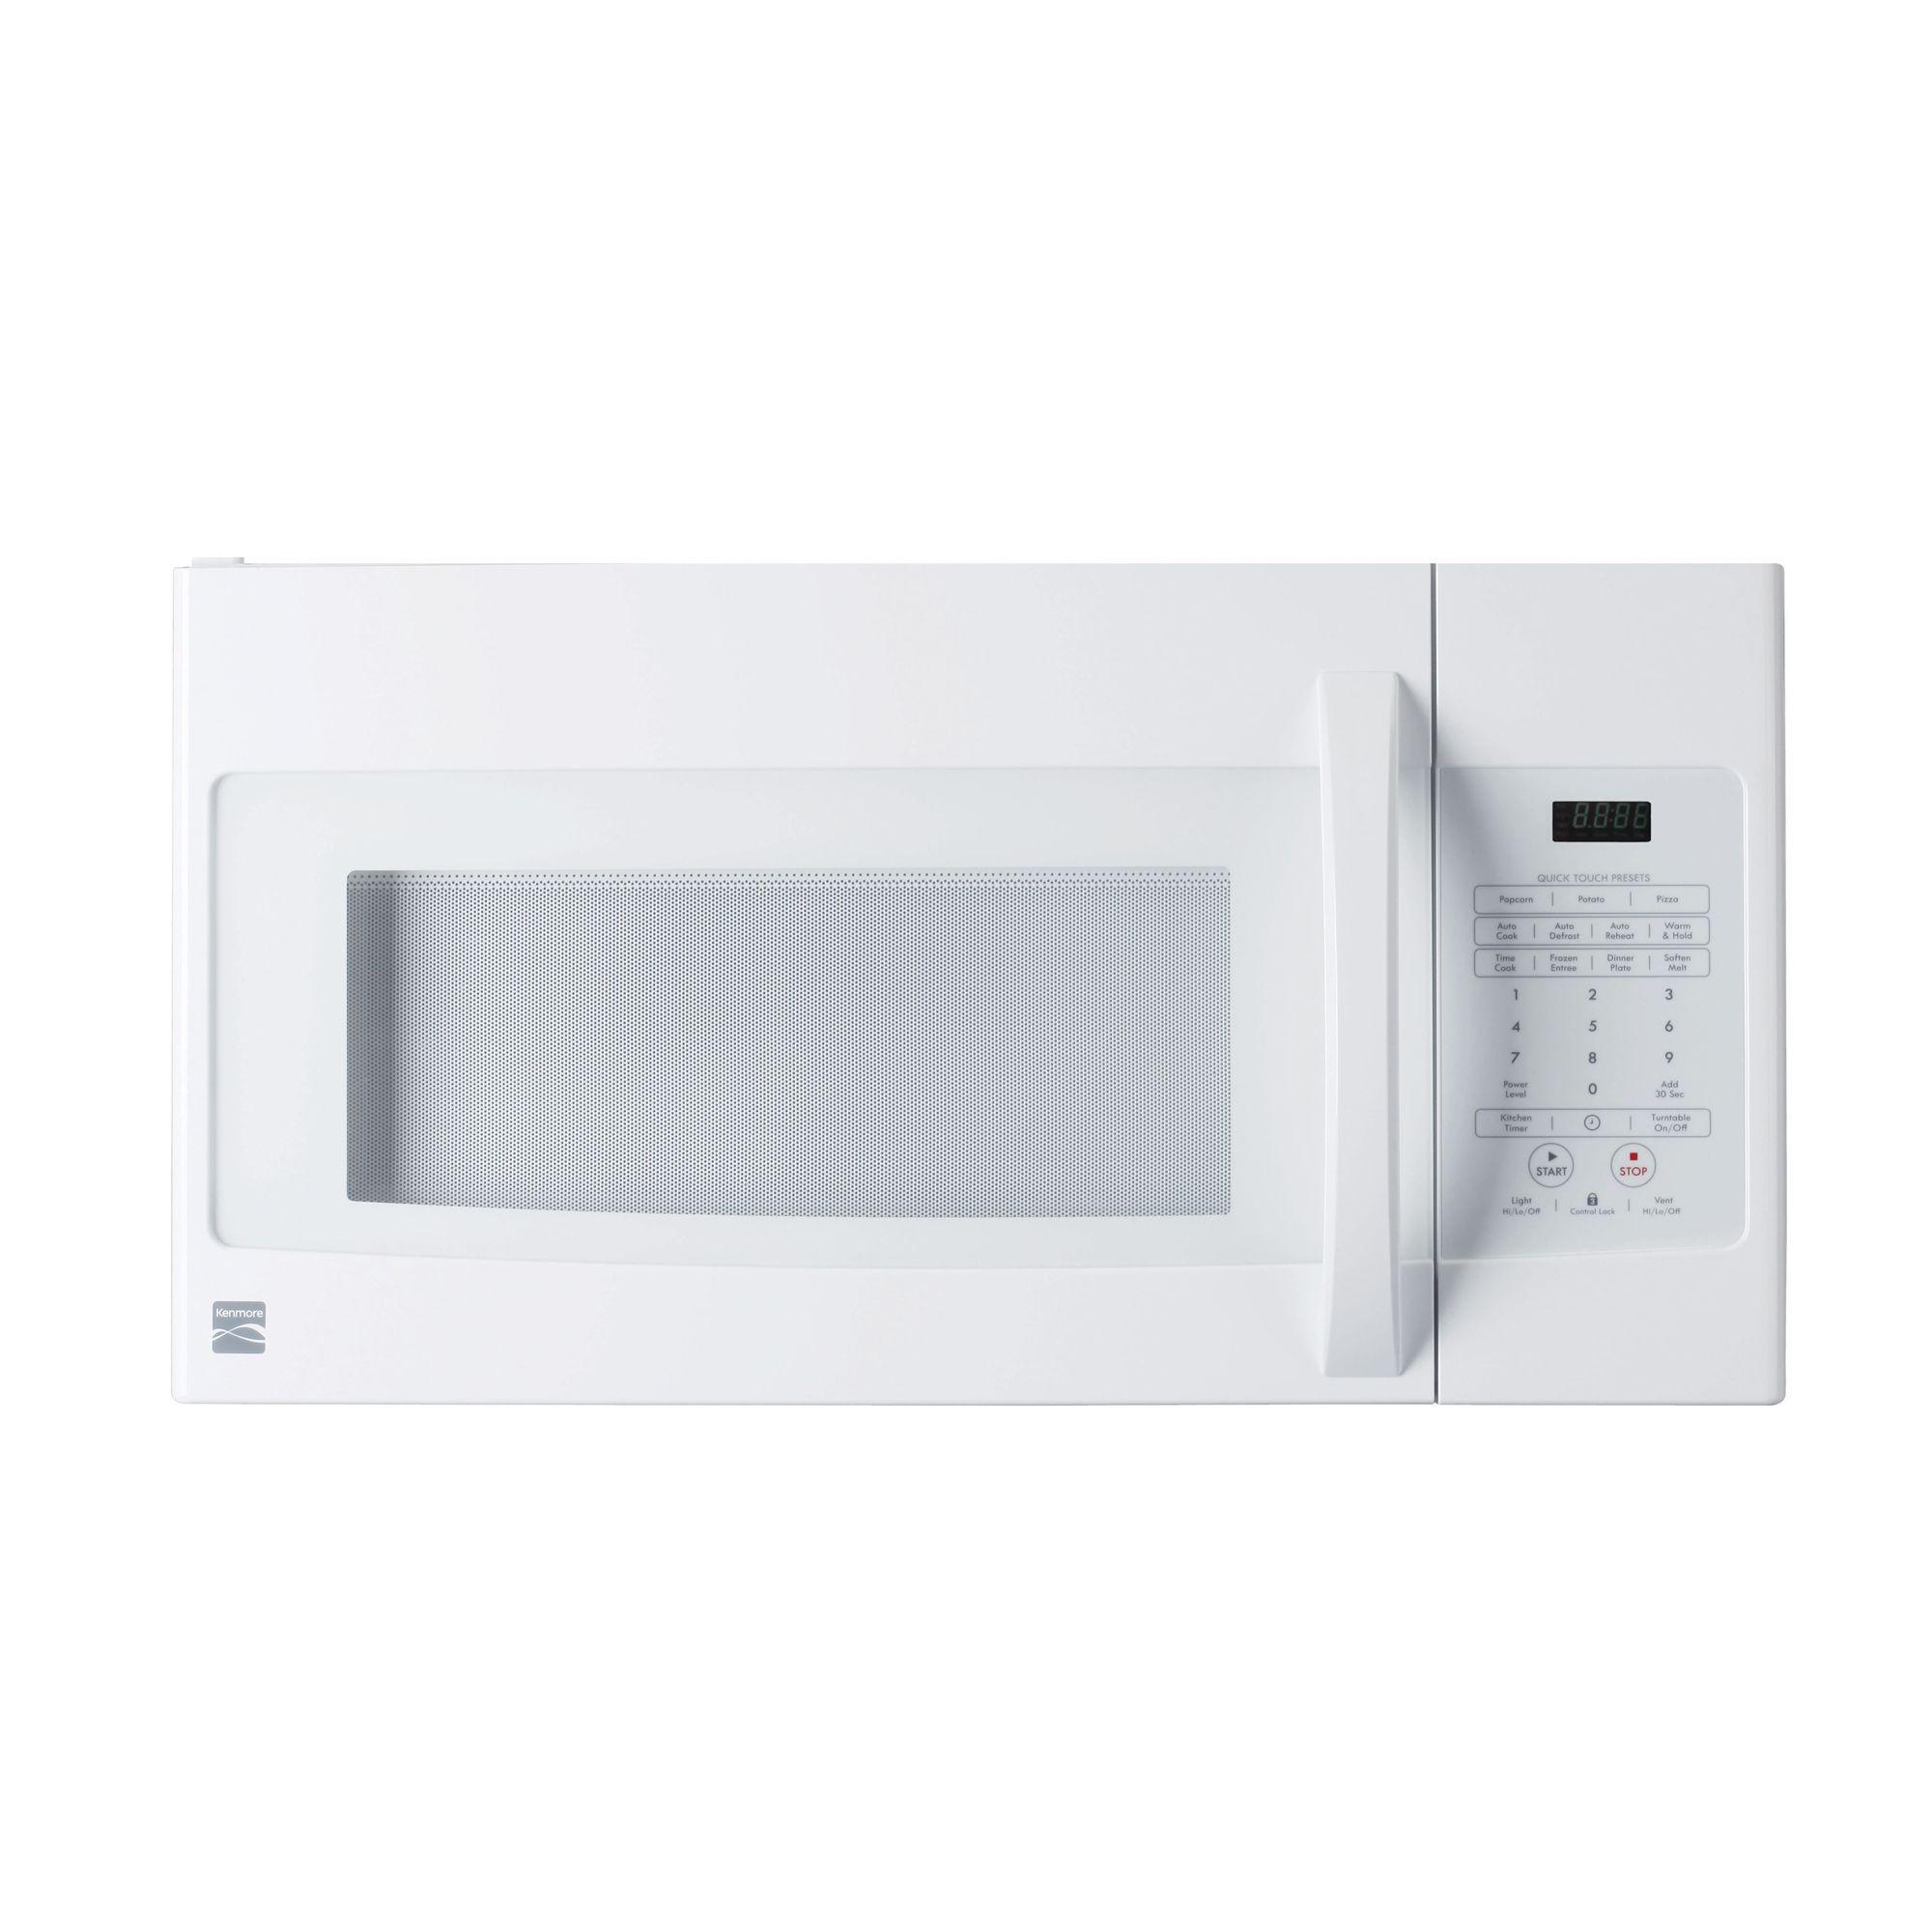 Range Microwave 1 6 Cu Ft 85032